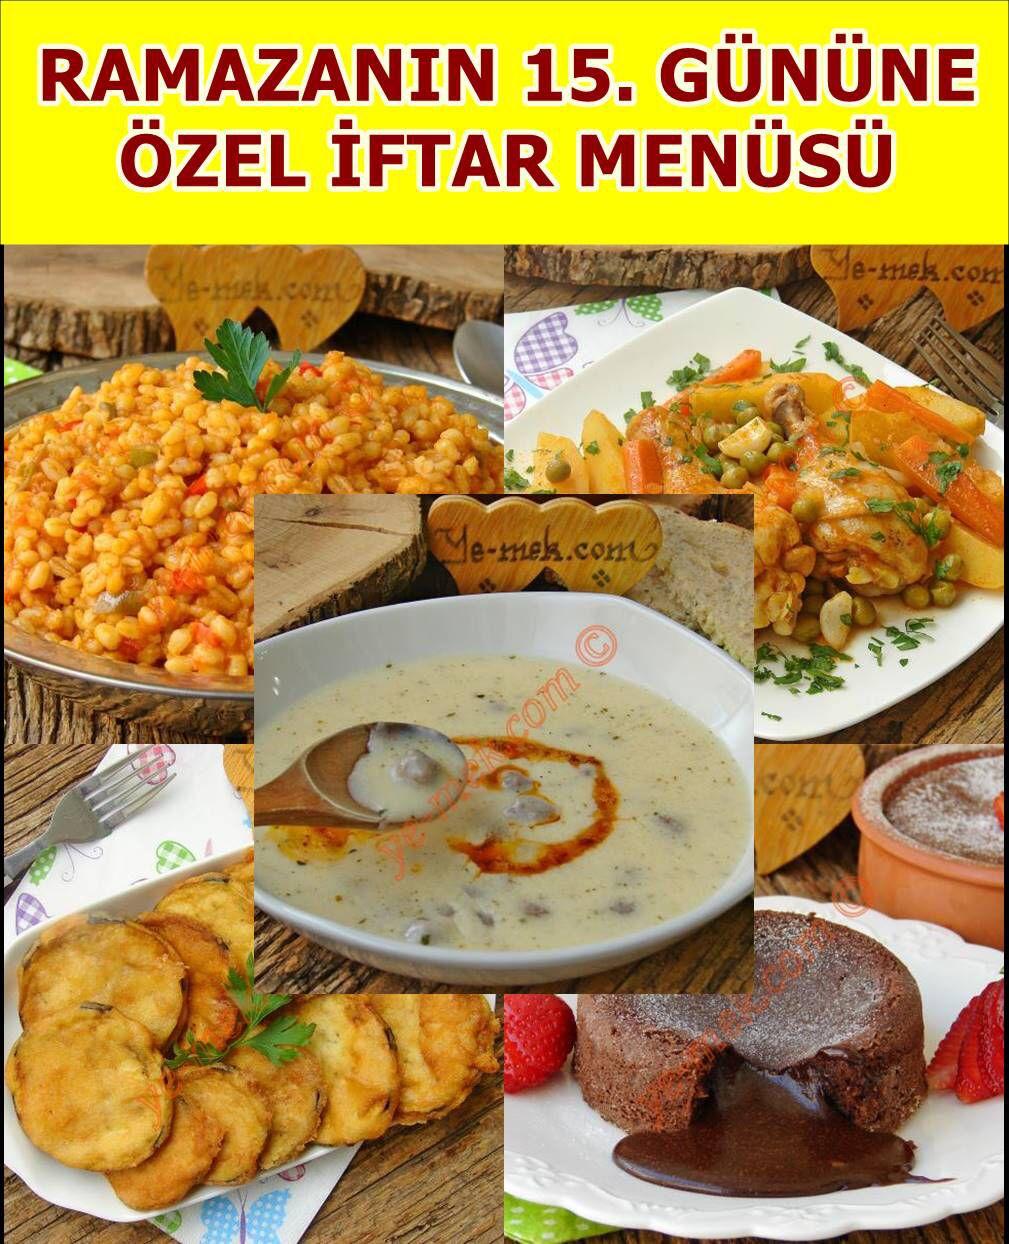 15 Gunun Ramazan Menusu Iftar Menuleri Kolay Yemek Tarifleri Iftar Yemek Tarifleri